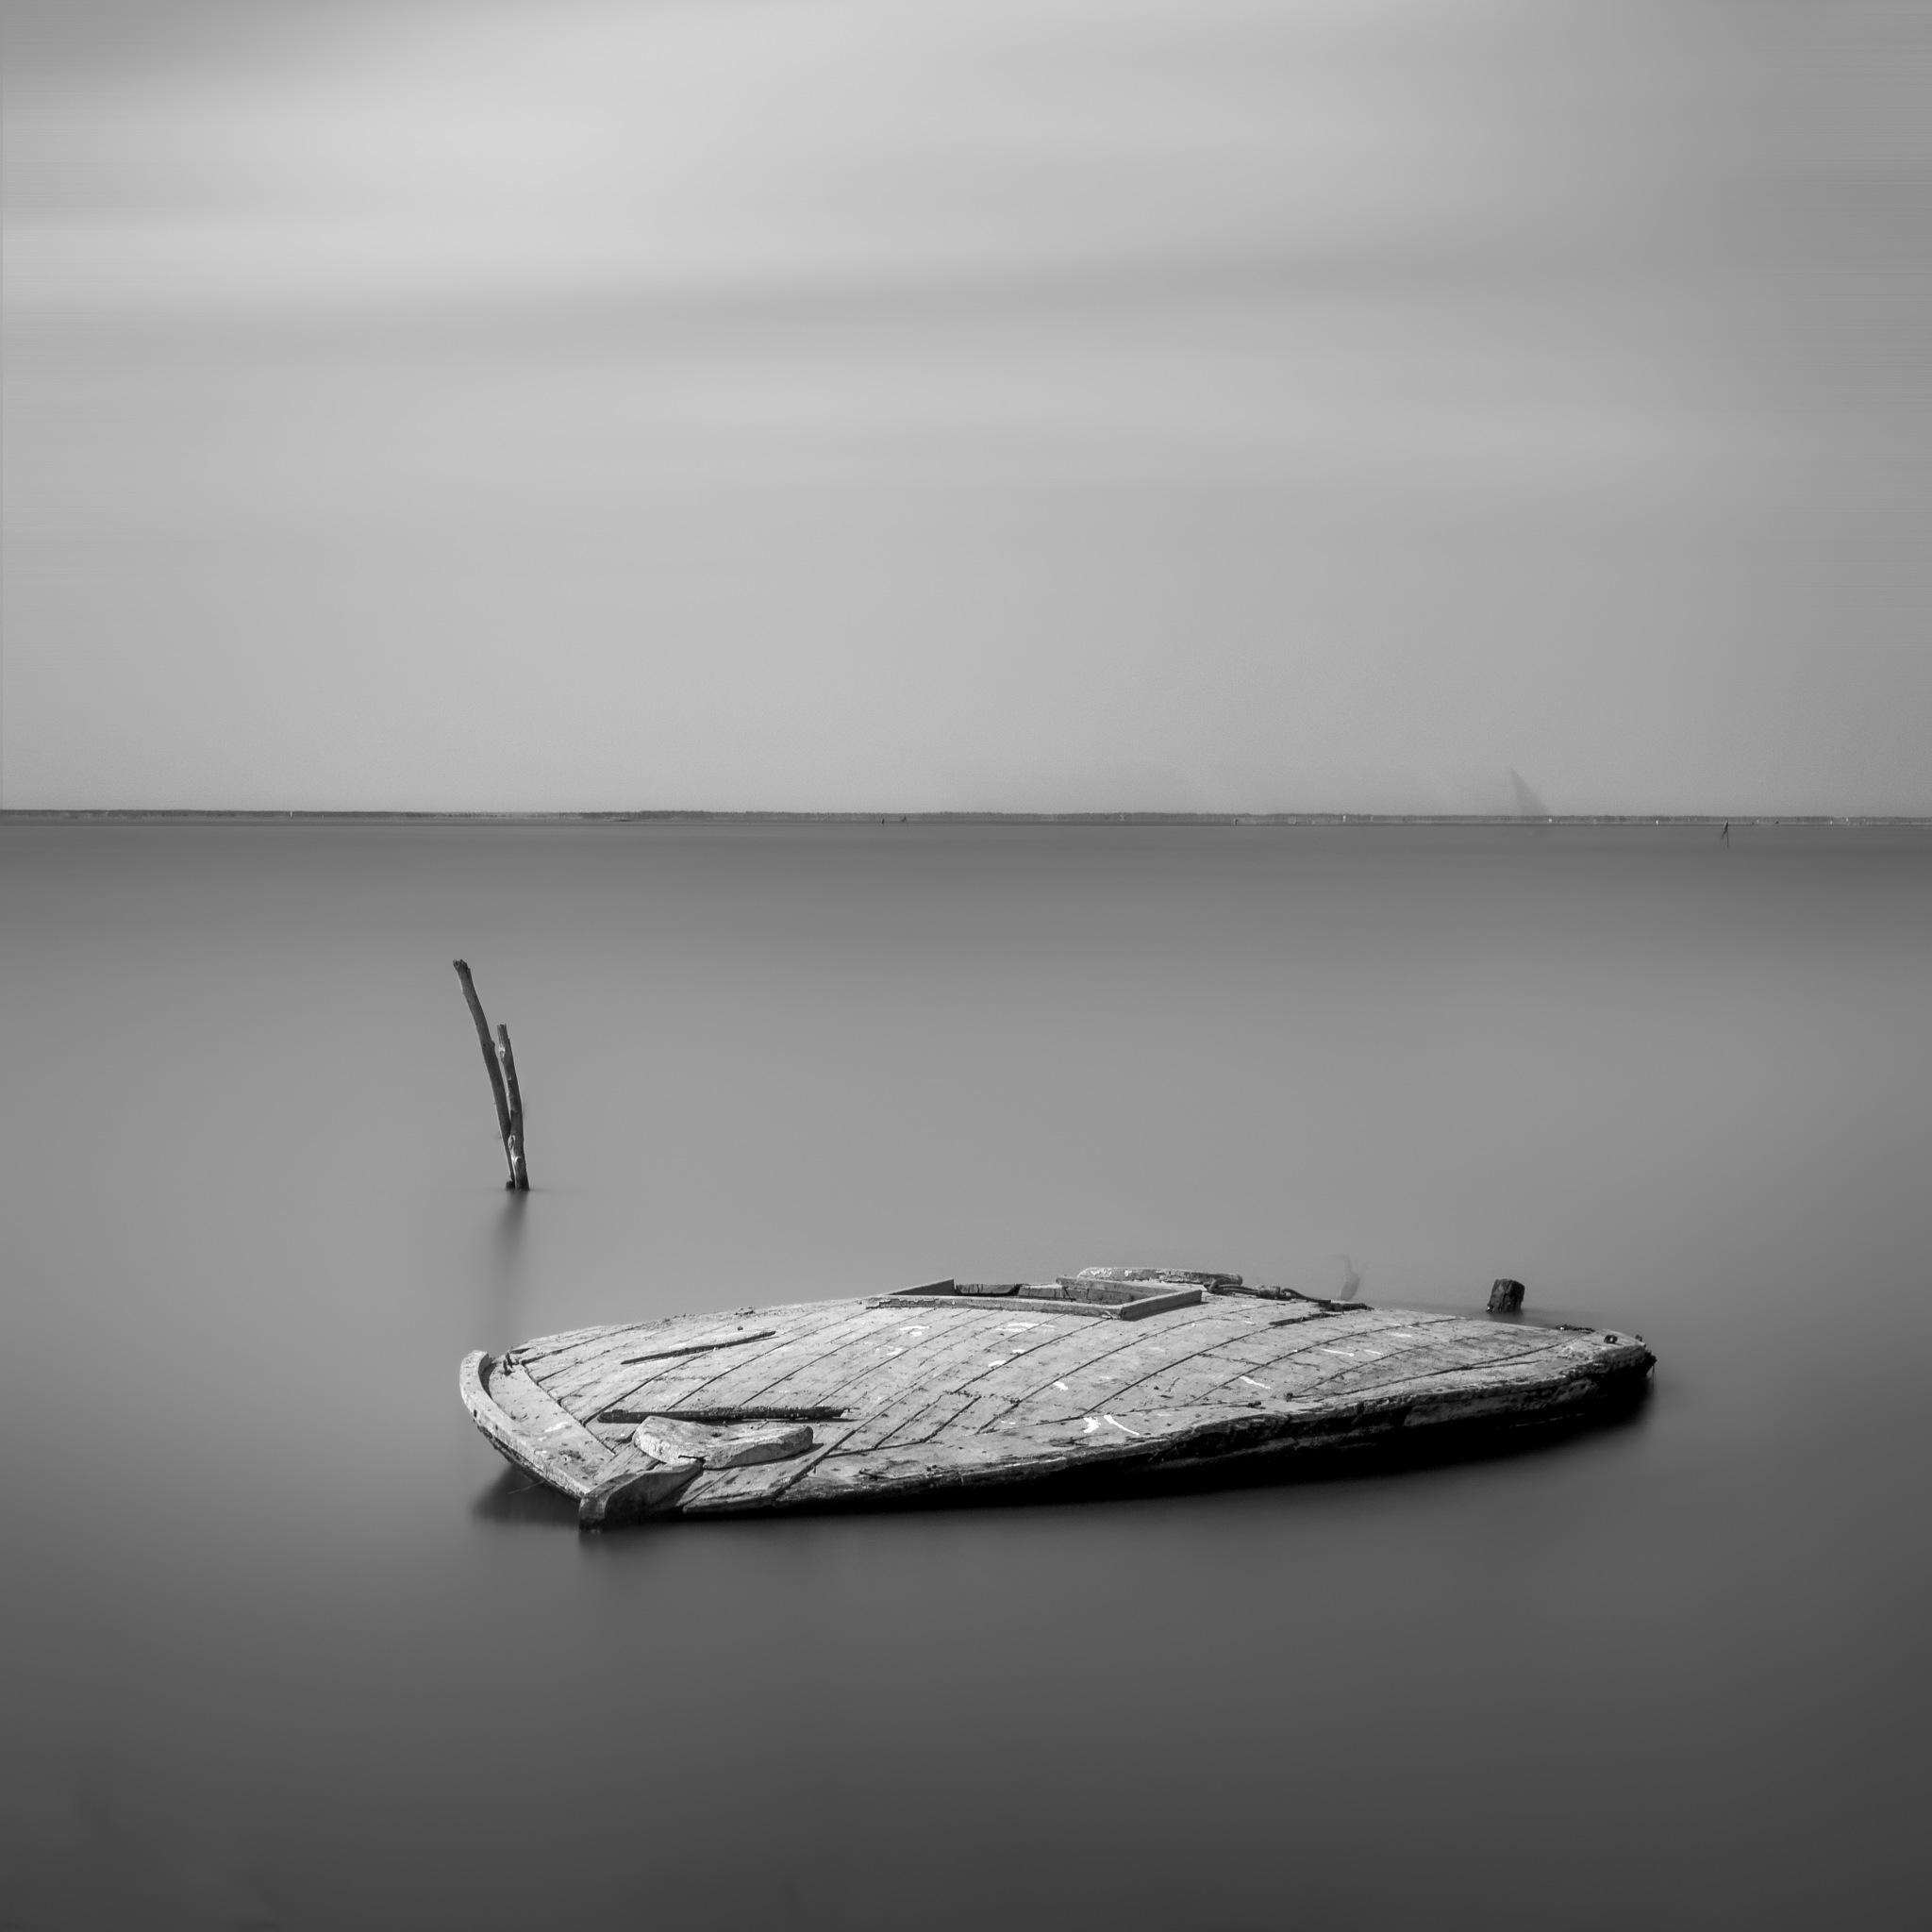 Untitled by mohamedwwe26